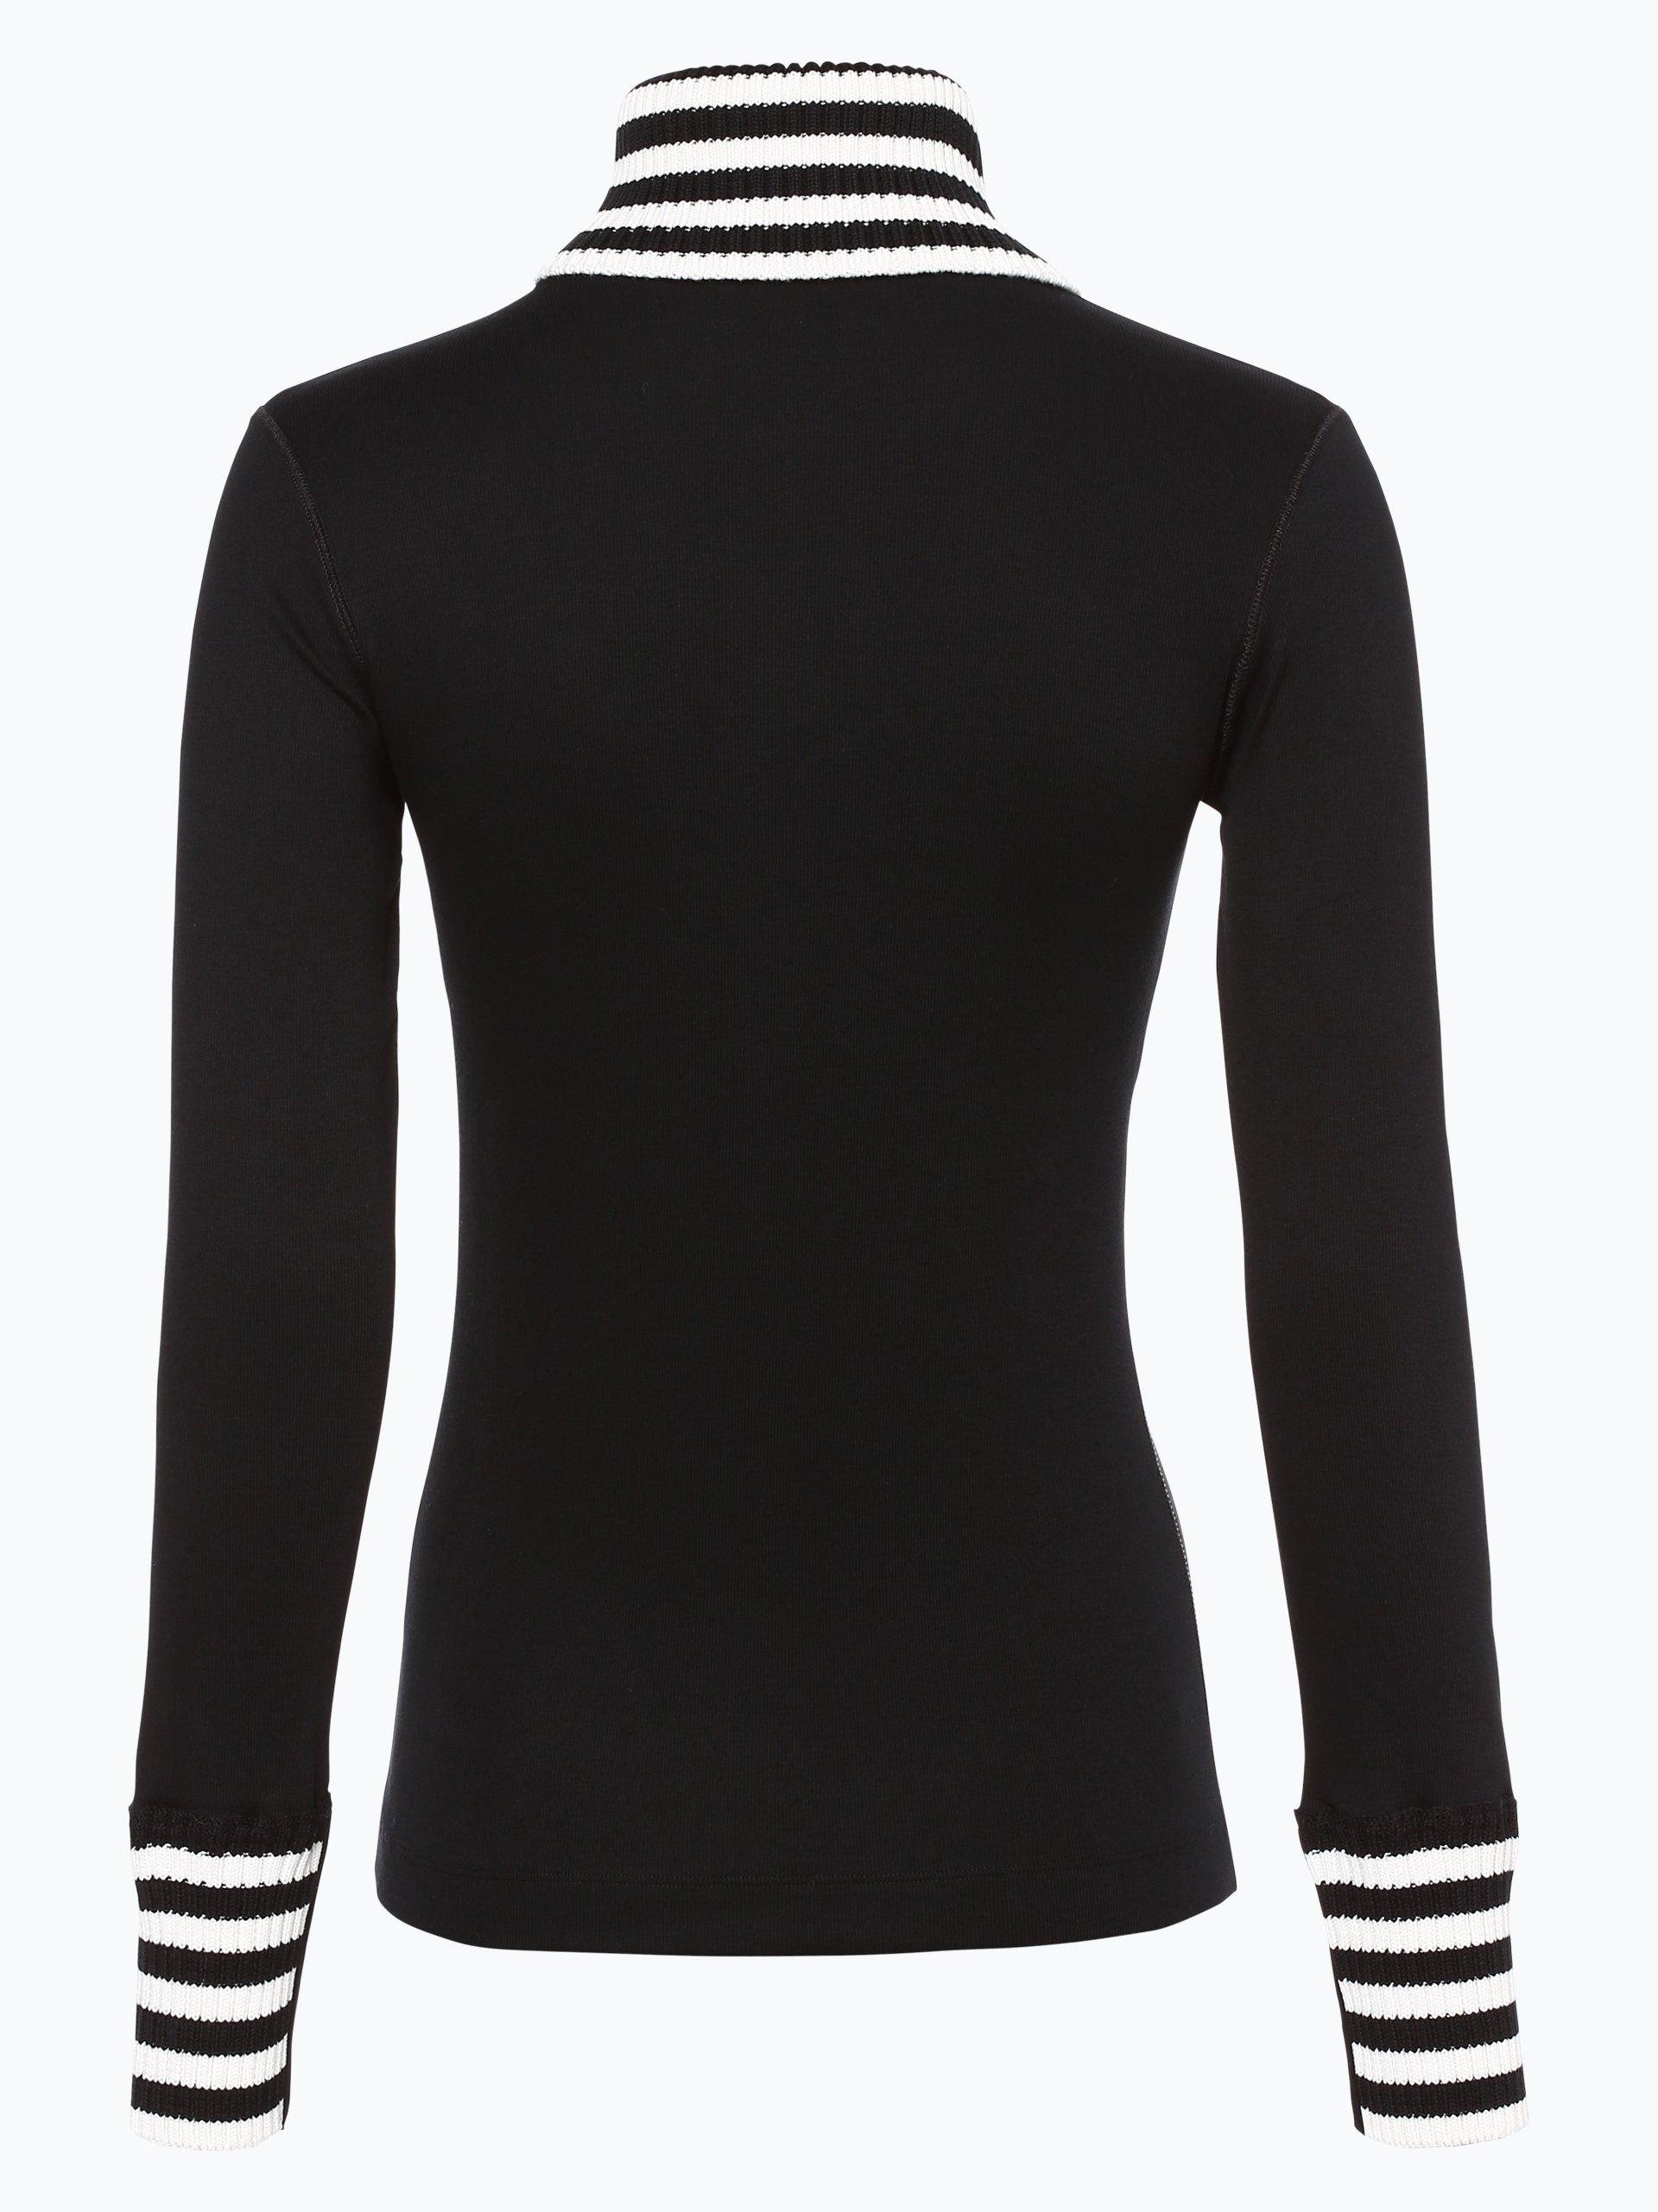 marc cain sports damen langarmshirt schwarz gestreift online kaufen vangraaf com. Black Bedroom Furniture Sets. Home Design Ideas